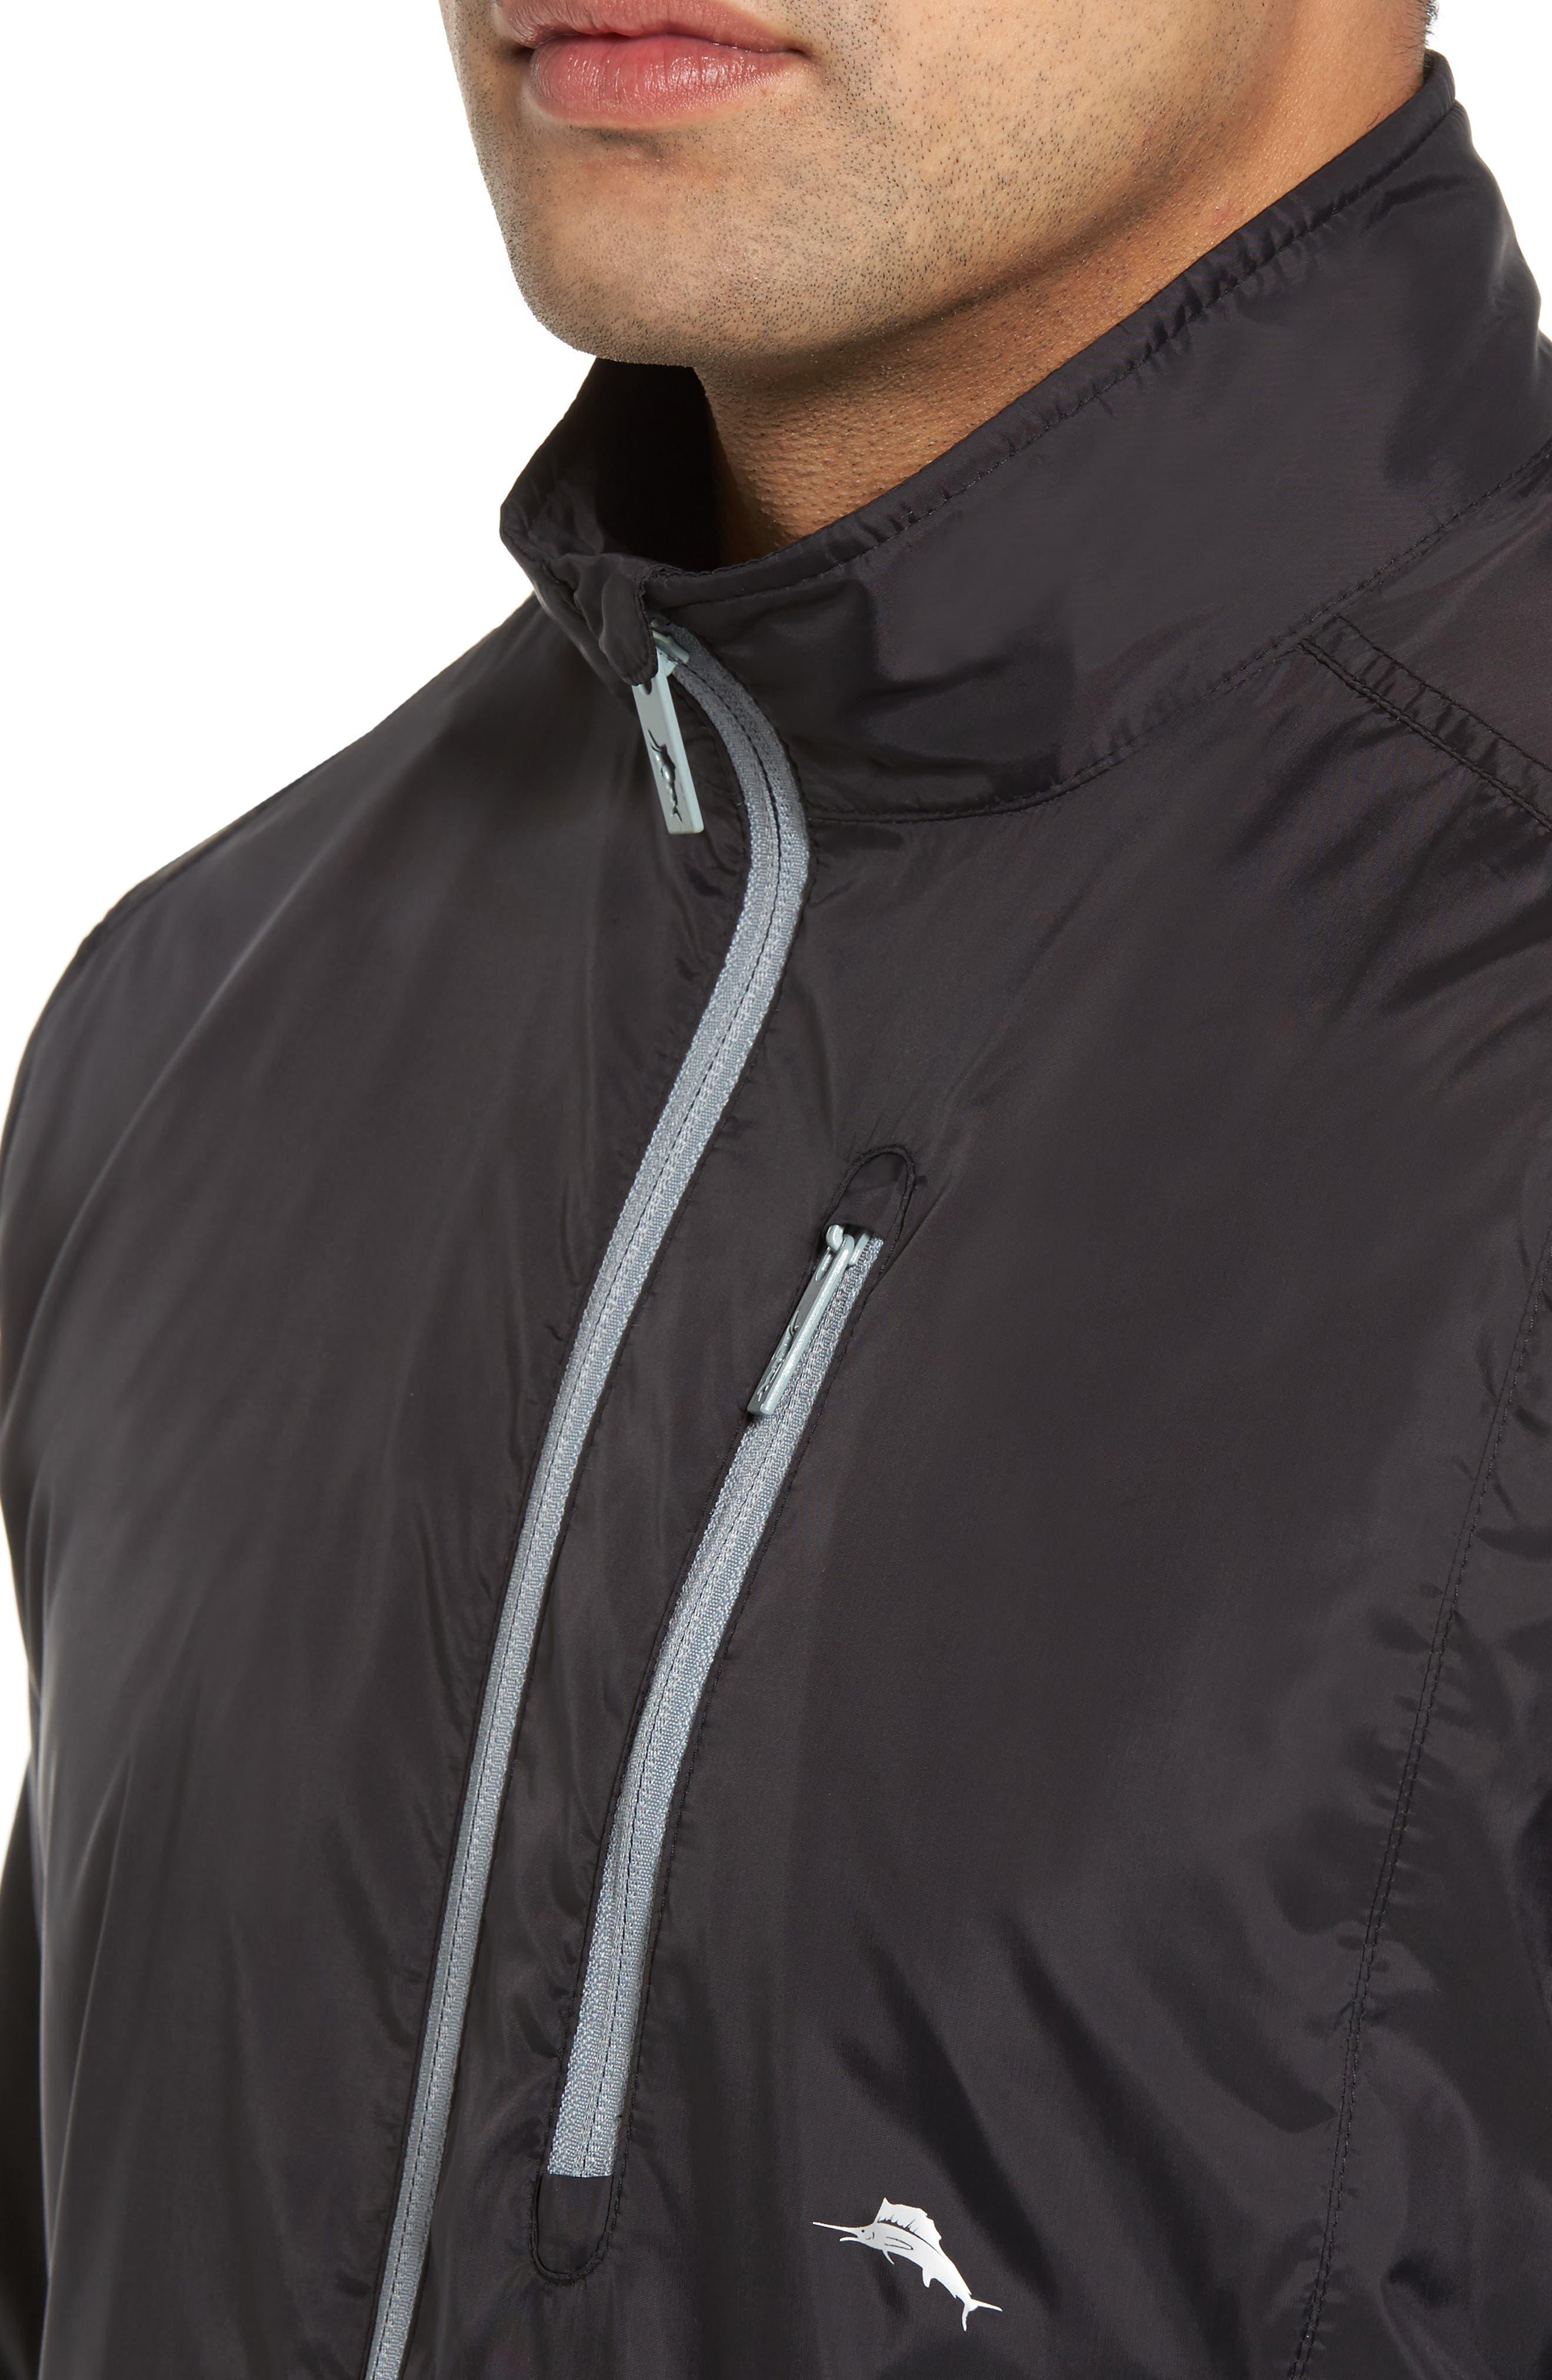 Nine Iron Water-Repellent Jacket,                             Alternate thumbnail 4, color,                             Black